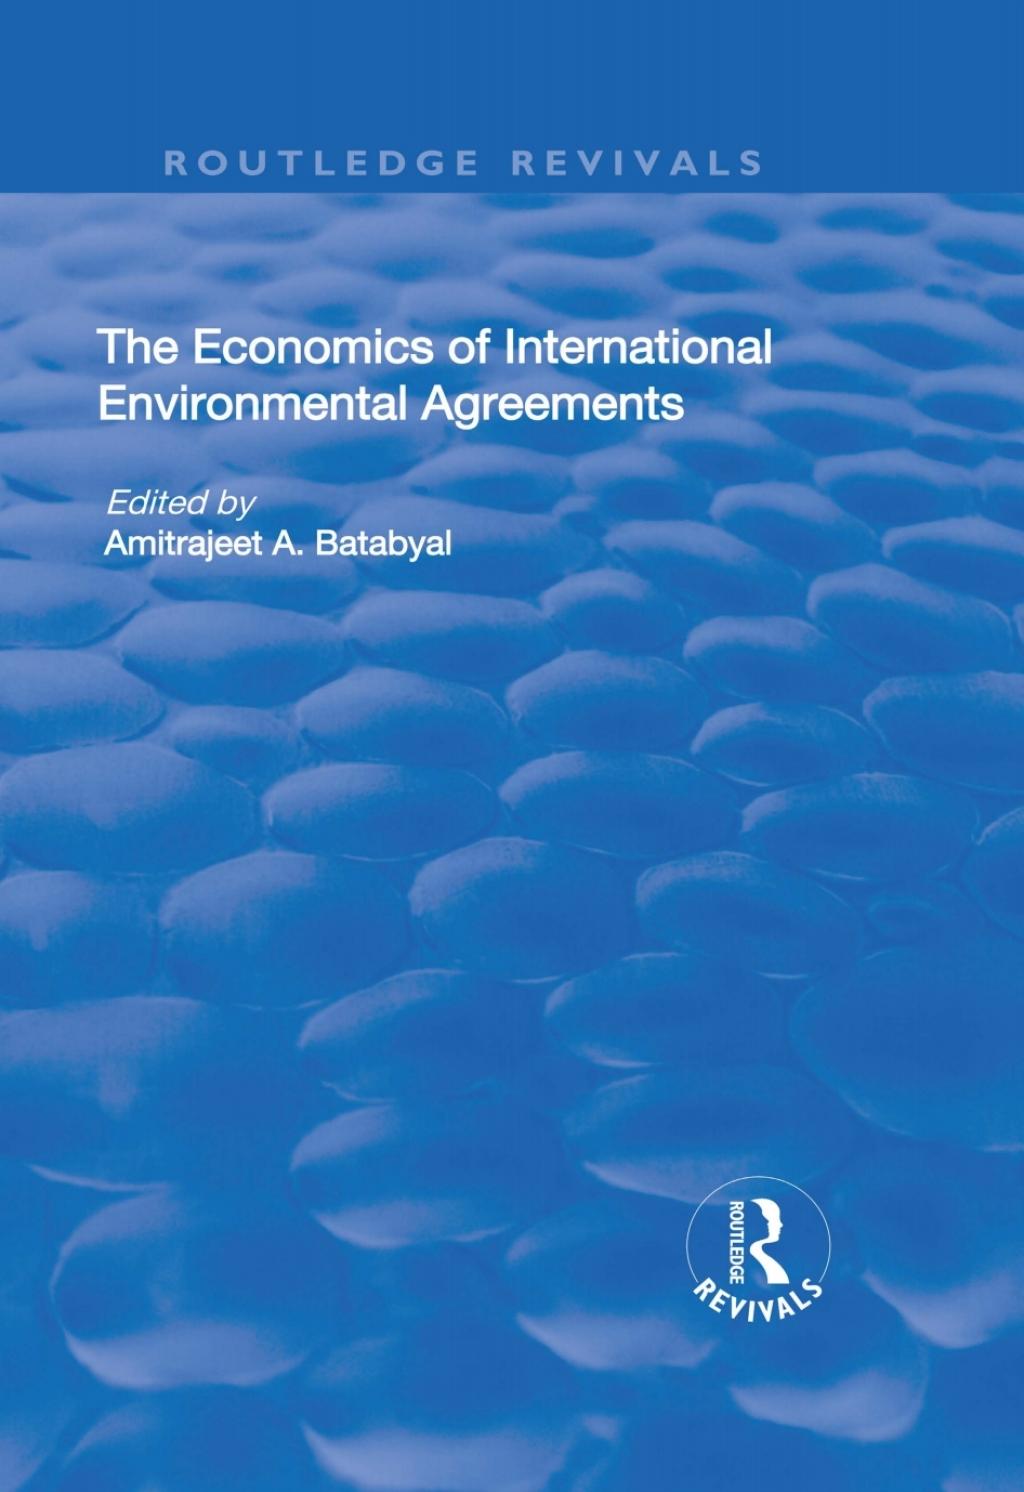 The Economics of International Environmental Agreements (eBook Rental)